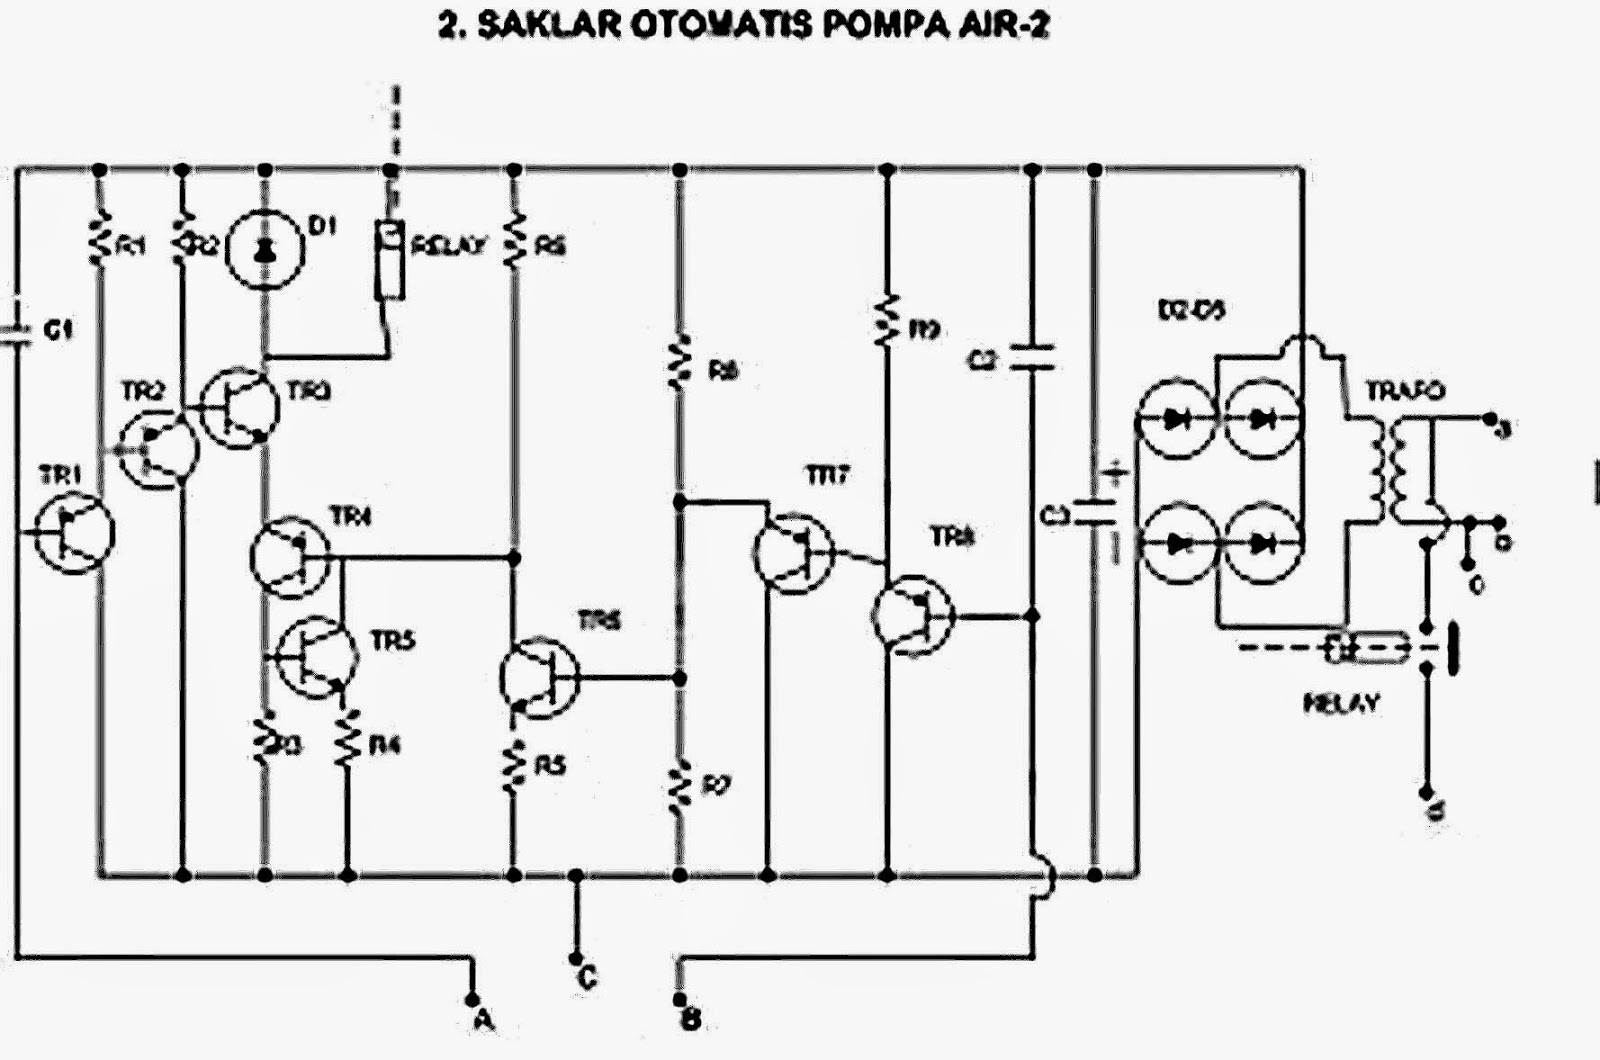 Rangkaian Saklar Otomatis Pompa Air Sensor Pendeteksi